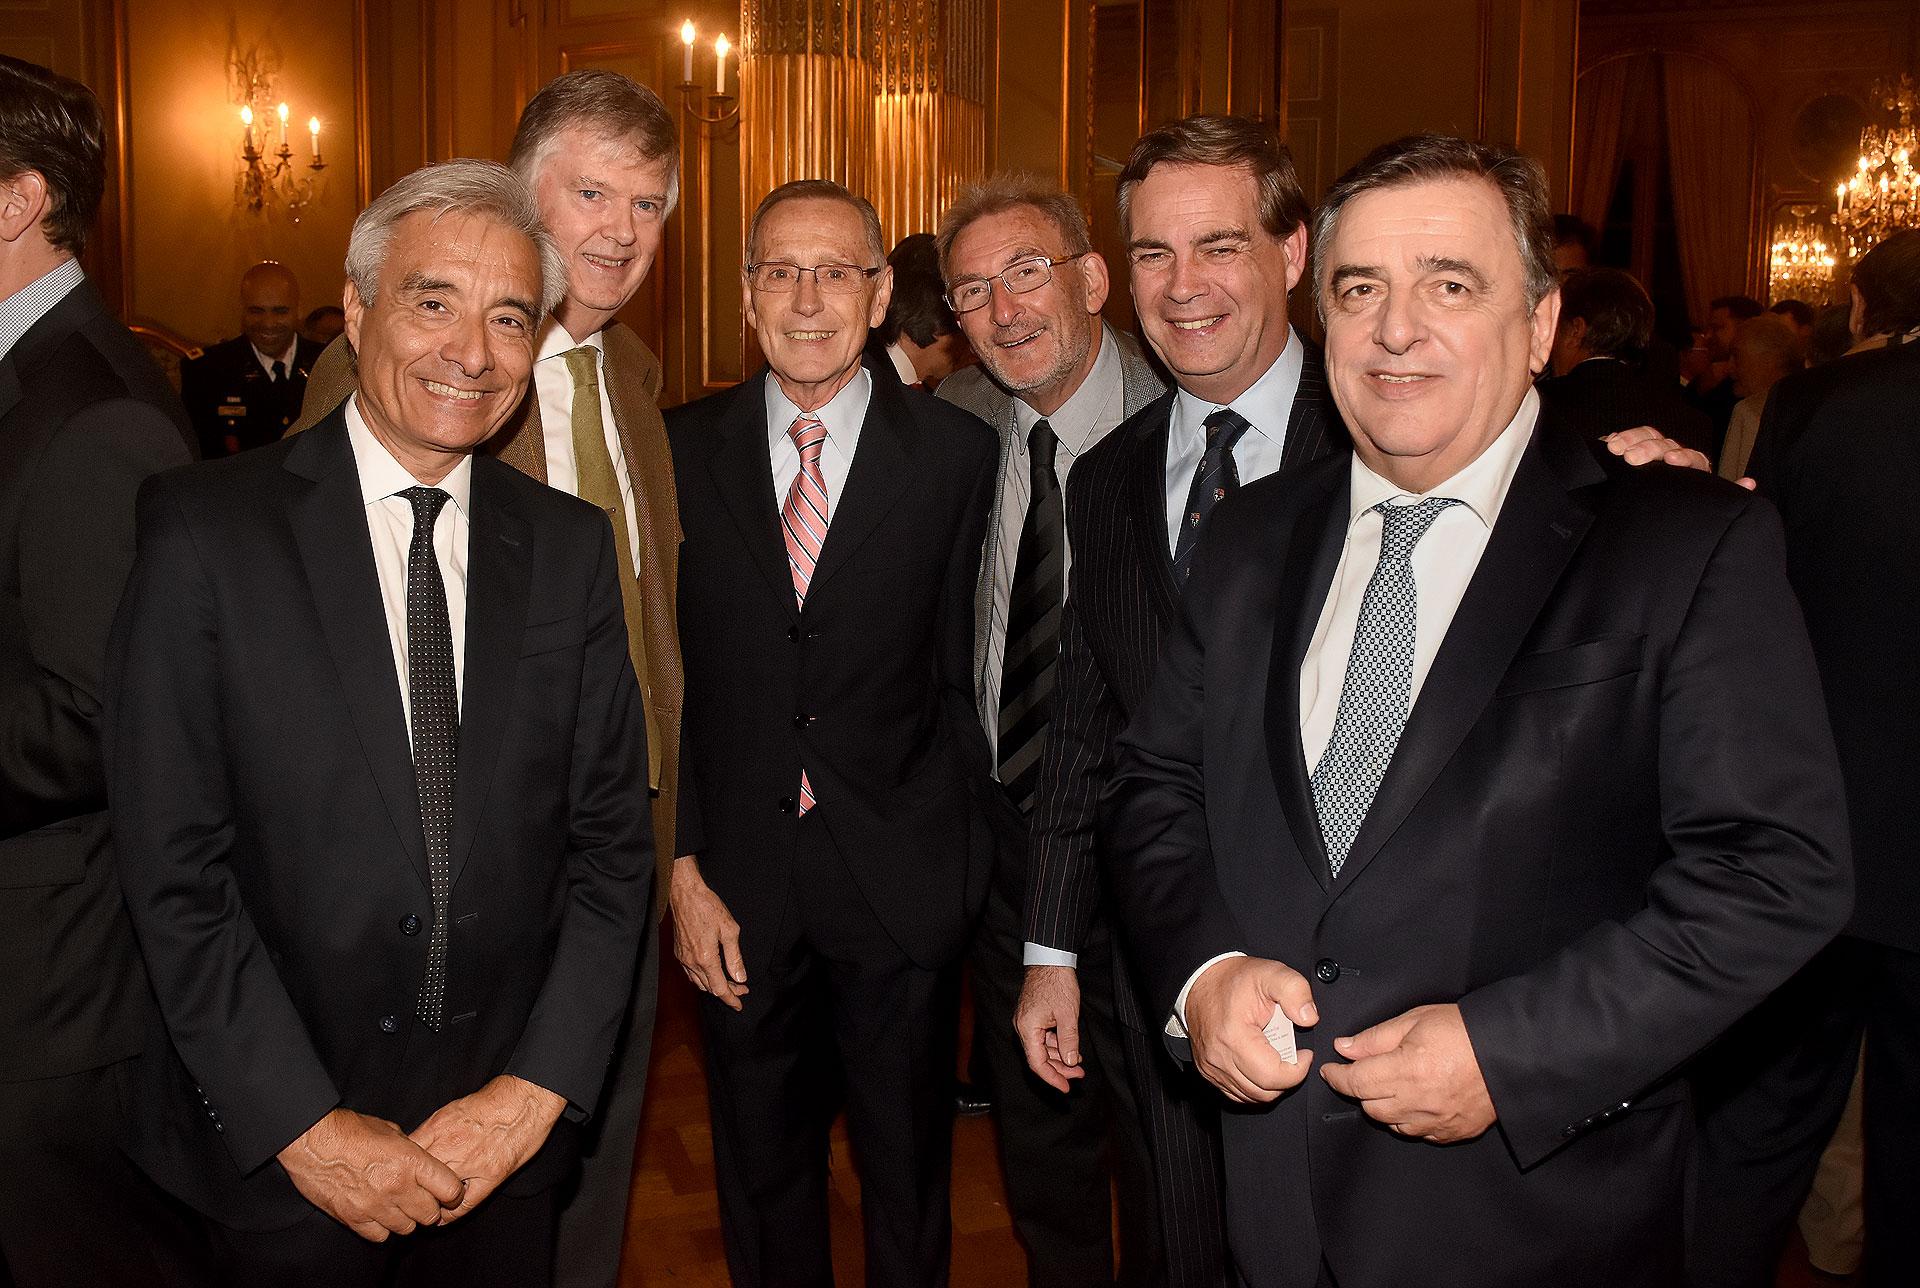 Eduardo Fidanza, Guillermo Stanley, Adalberto Rodríguez Giavarini, Guillermo Yanco, Patricio Carmody y Mario Negri